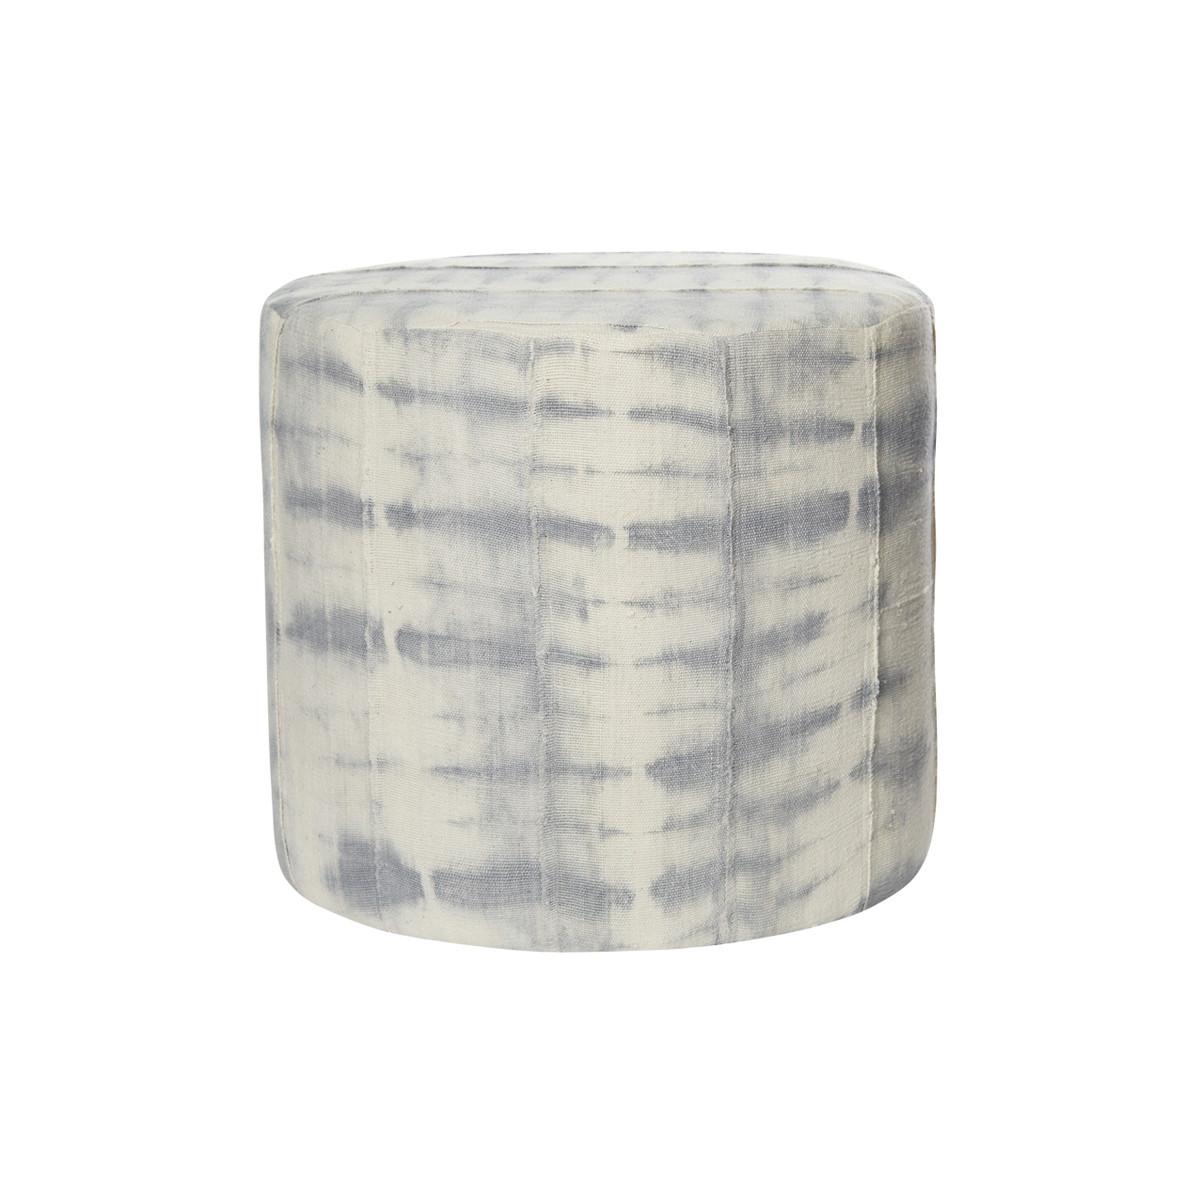 Kushi Gray Tie Dye Mud Cloth Pouf - Front